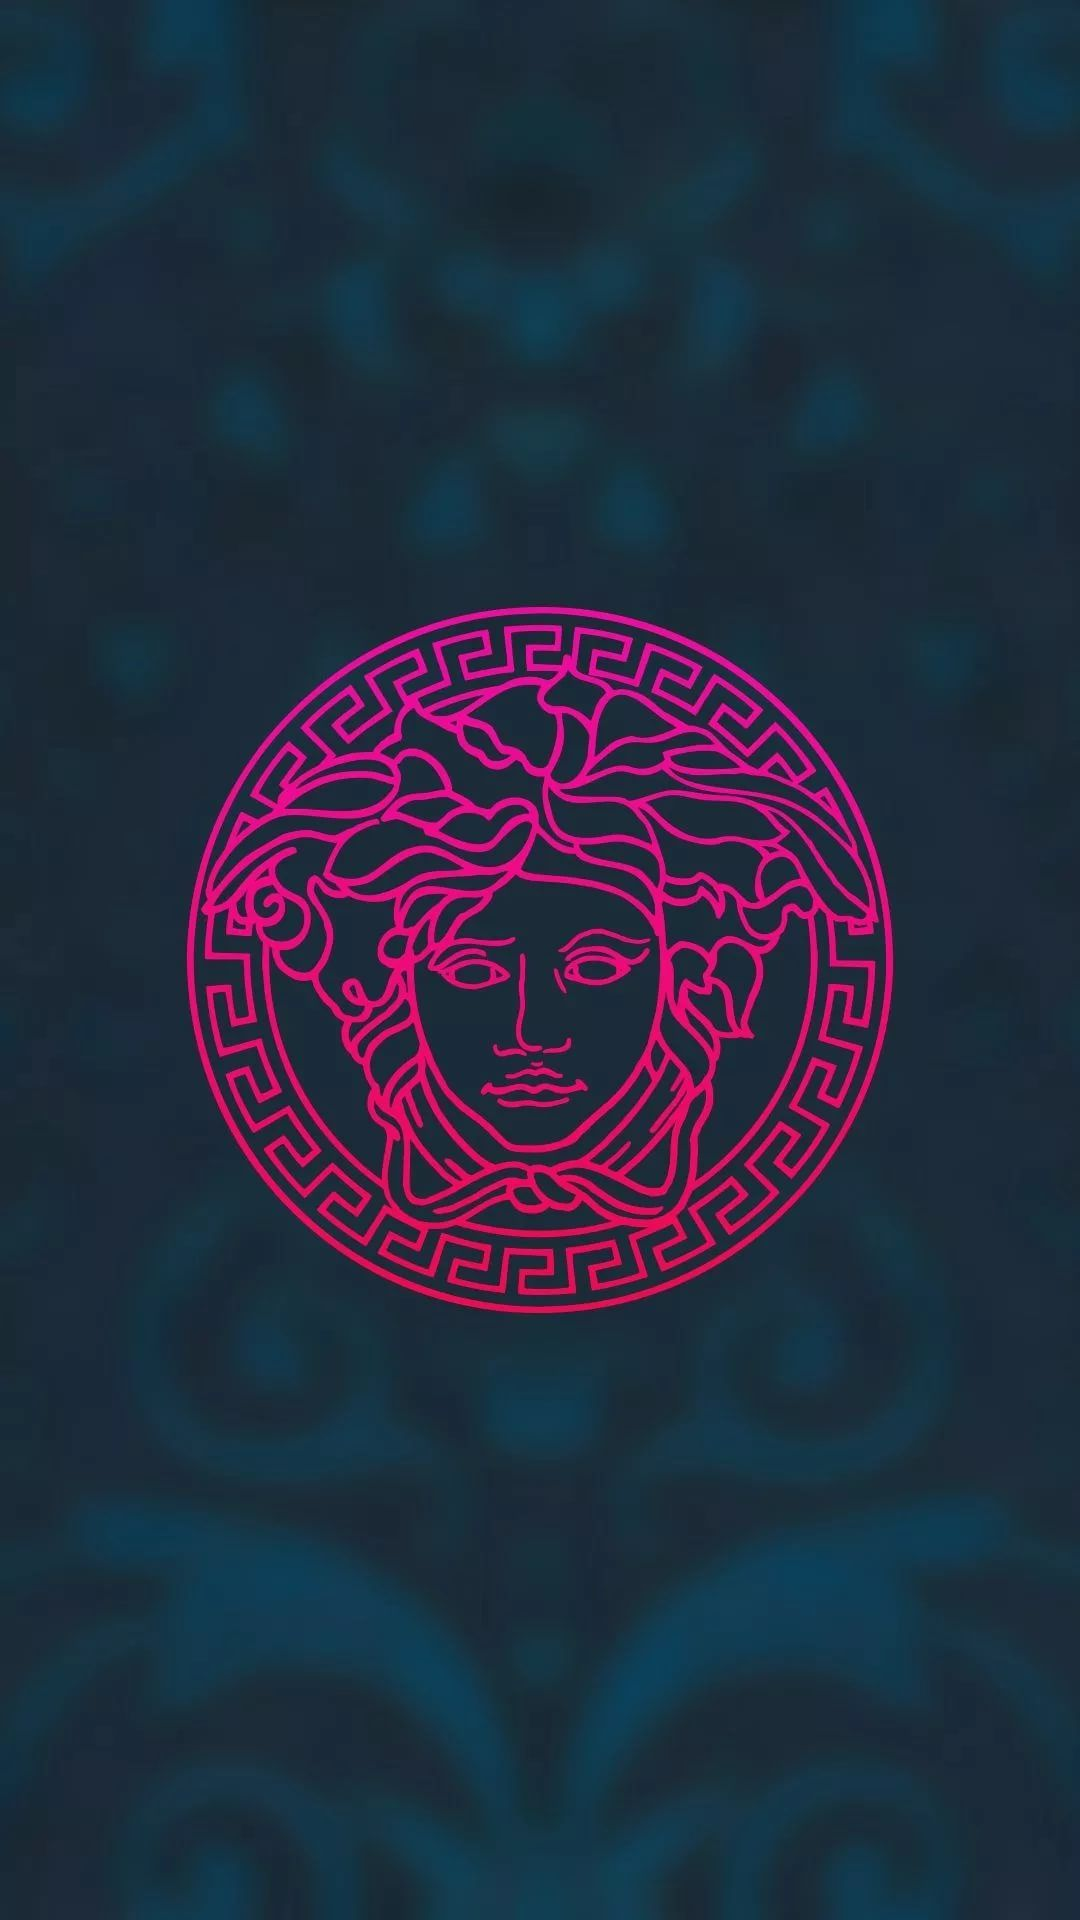 Versace iPhone hd wallpaper